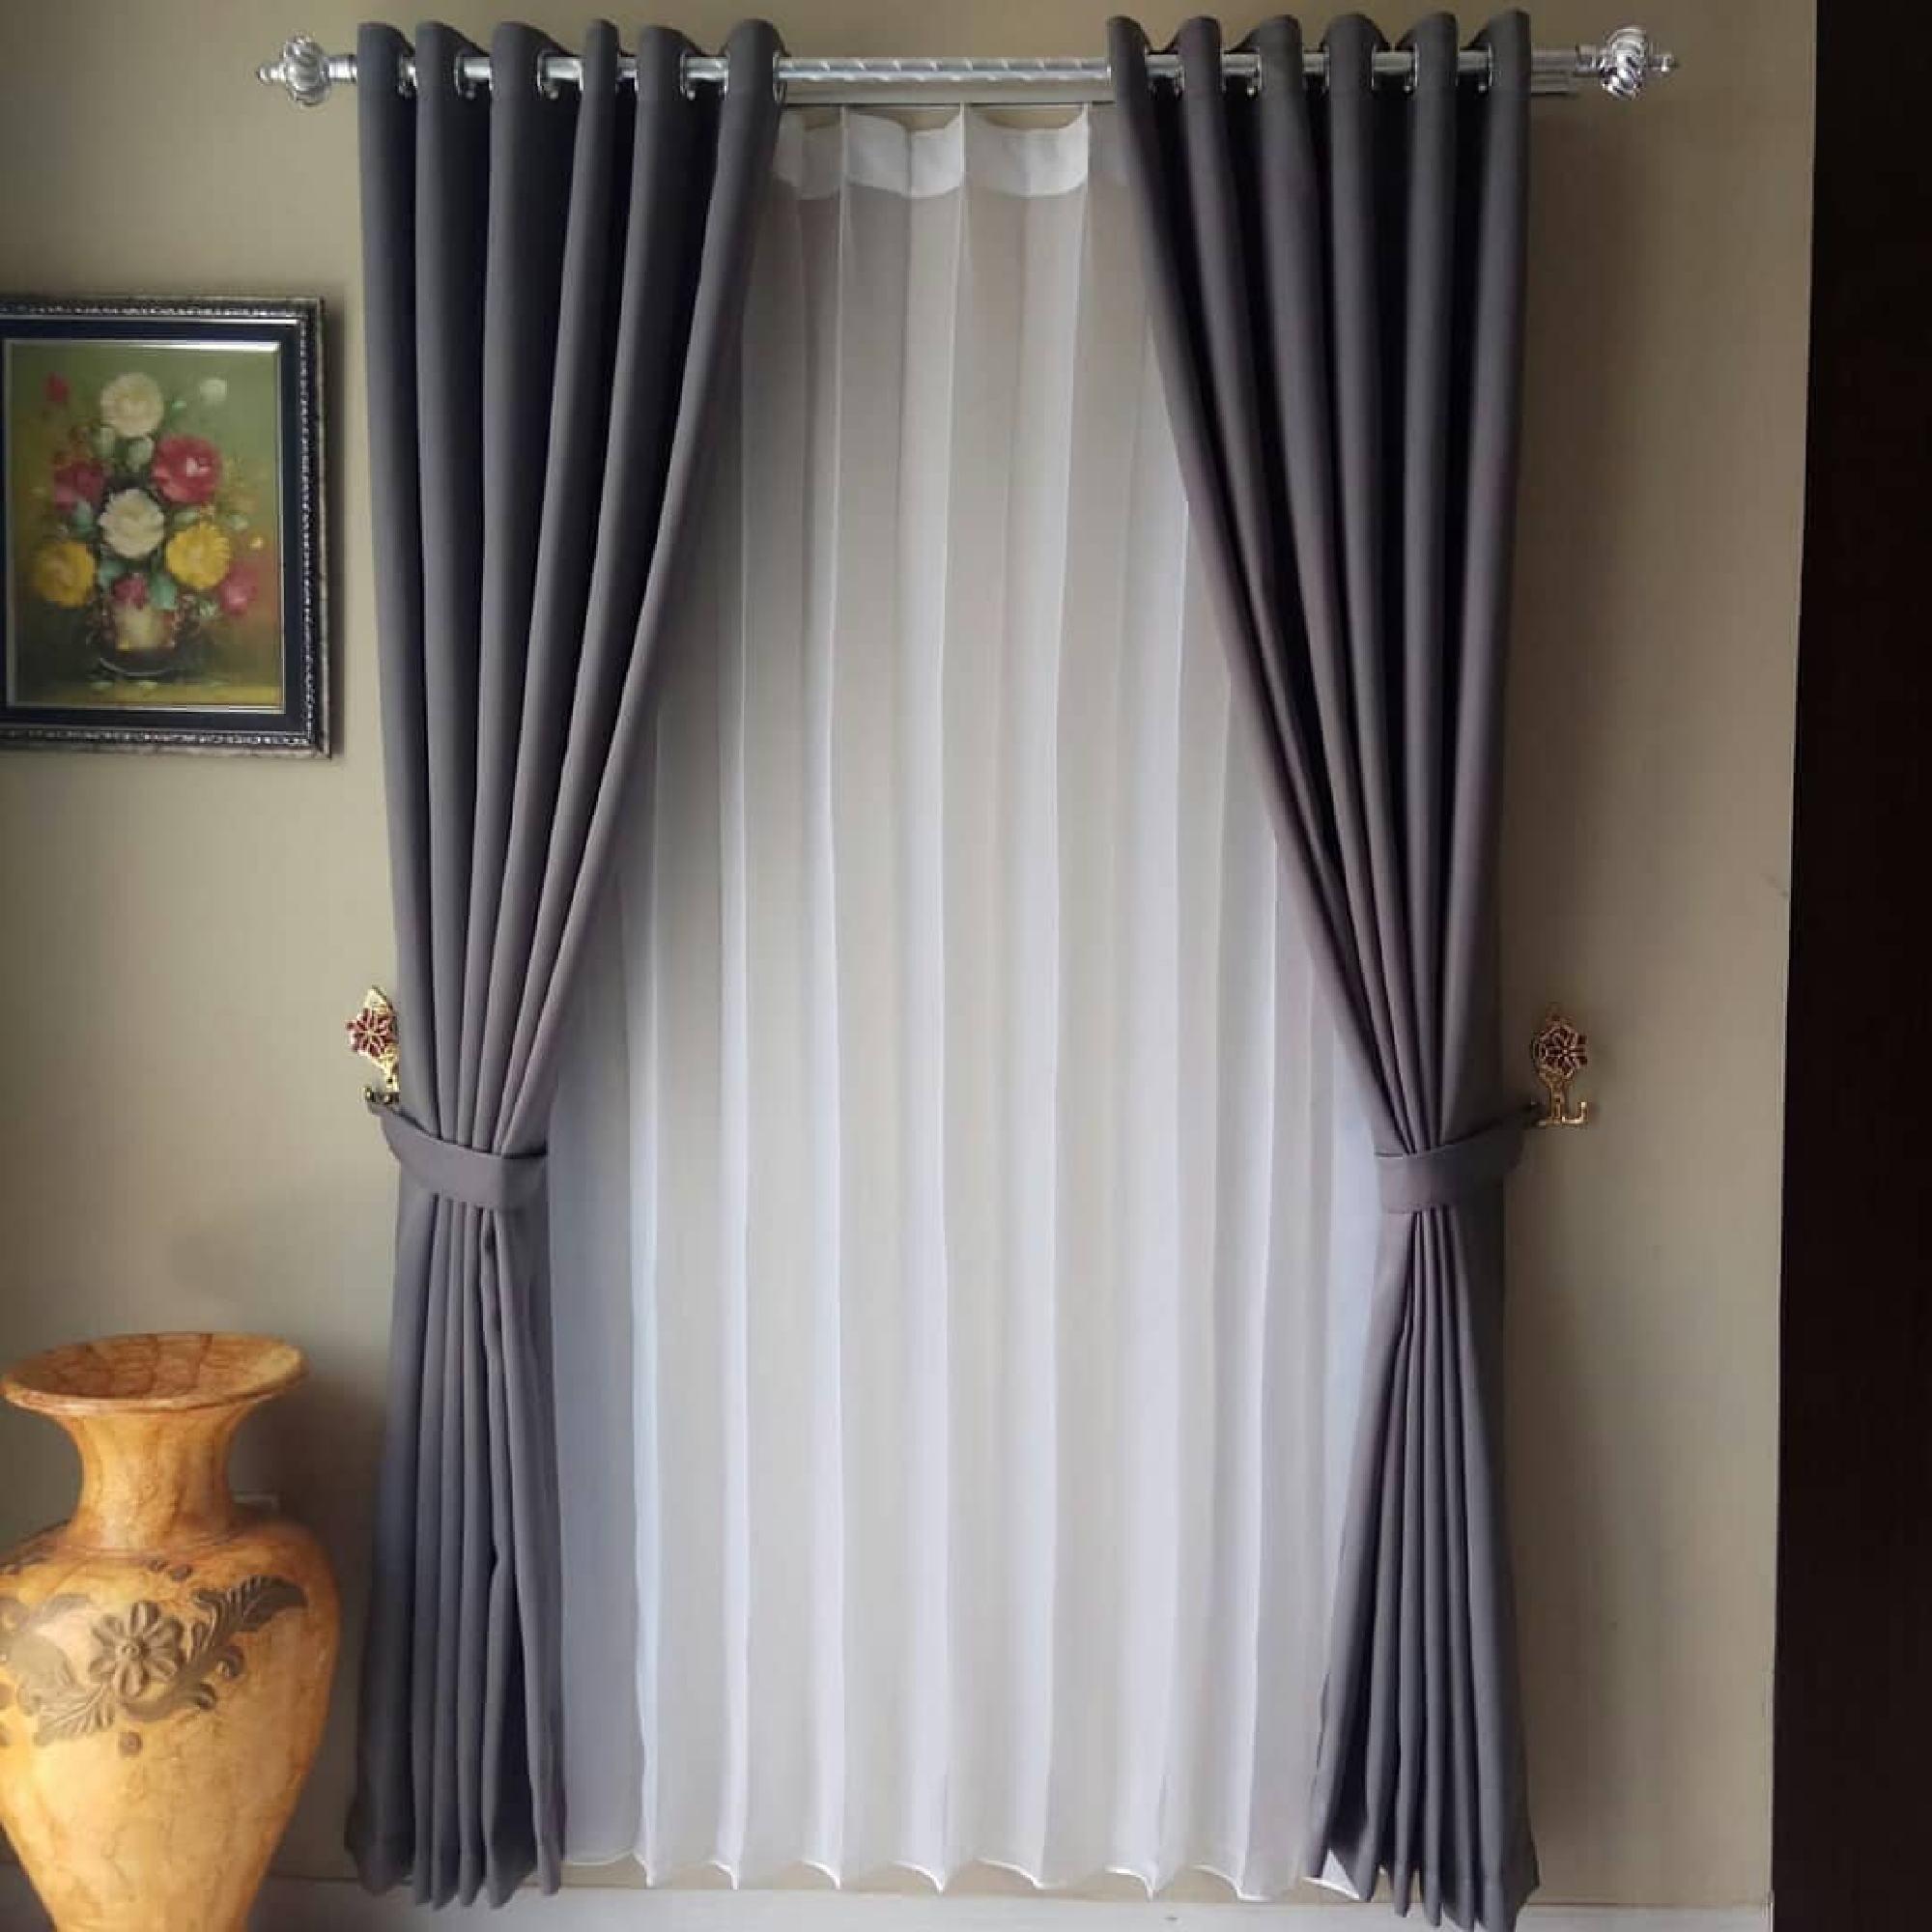 gorden jendela karakter doraemon – gorden jendela pintu bahan katun catra